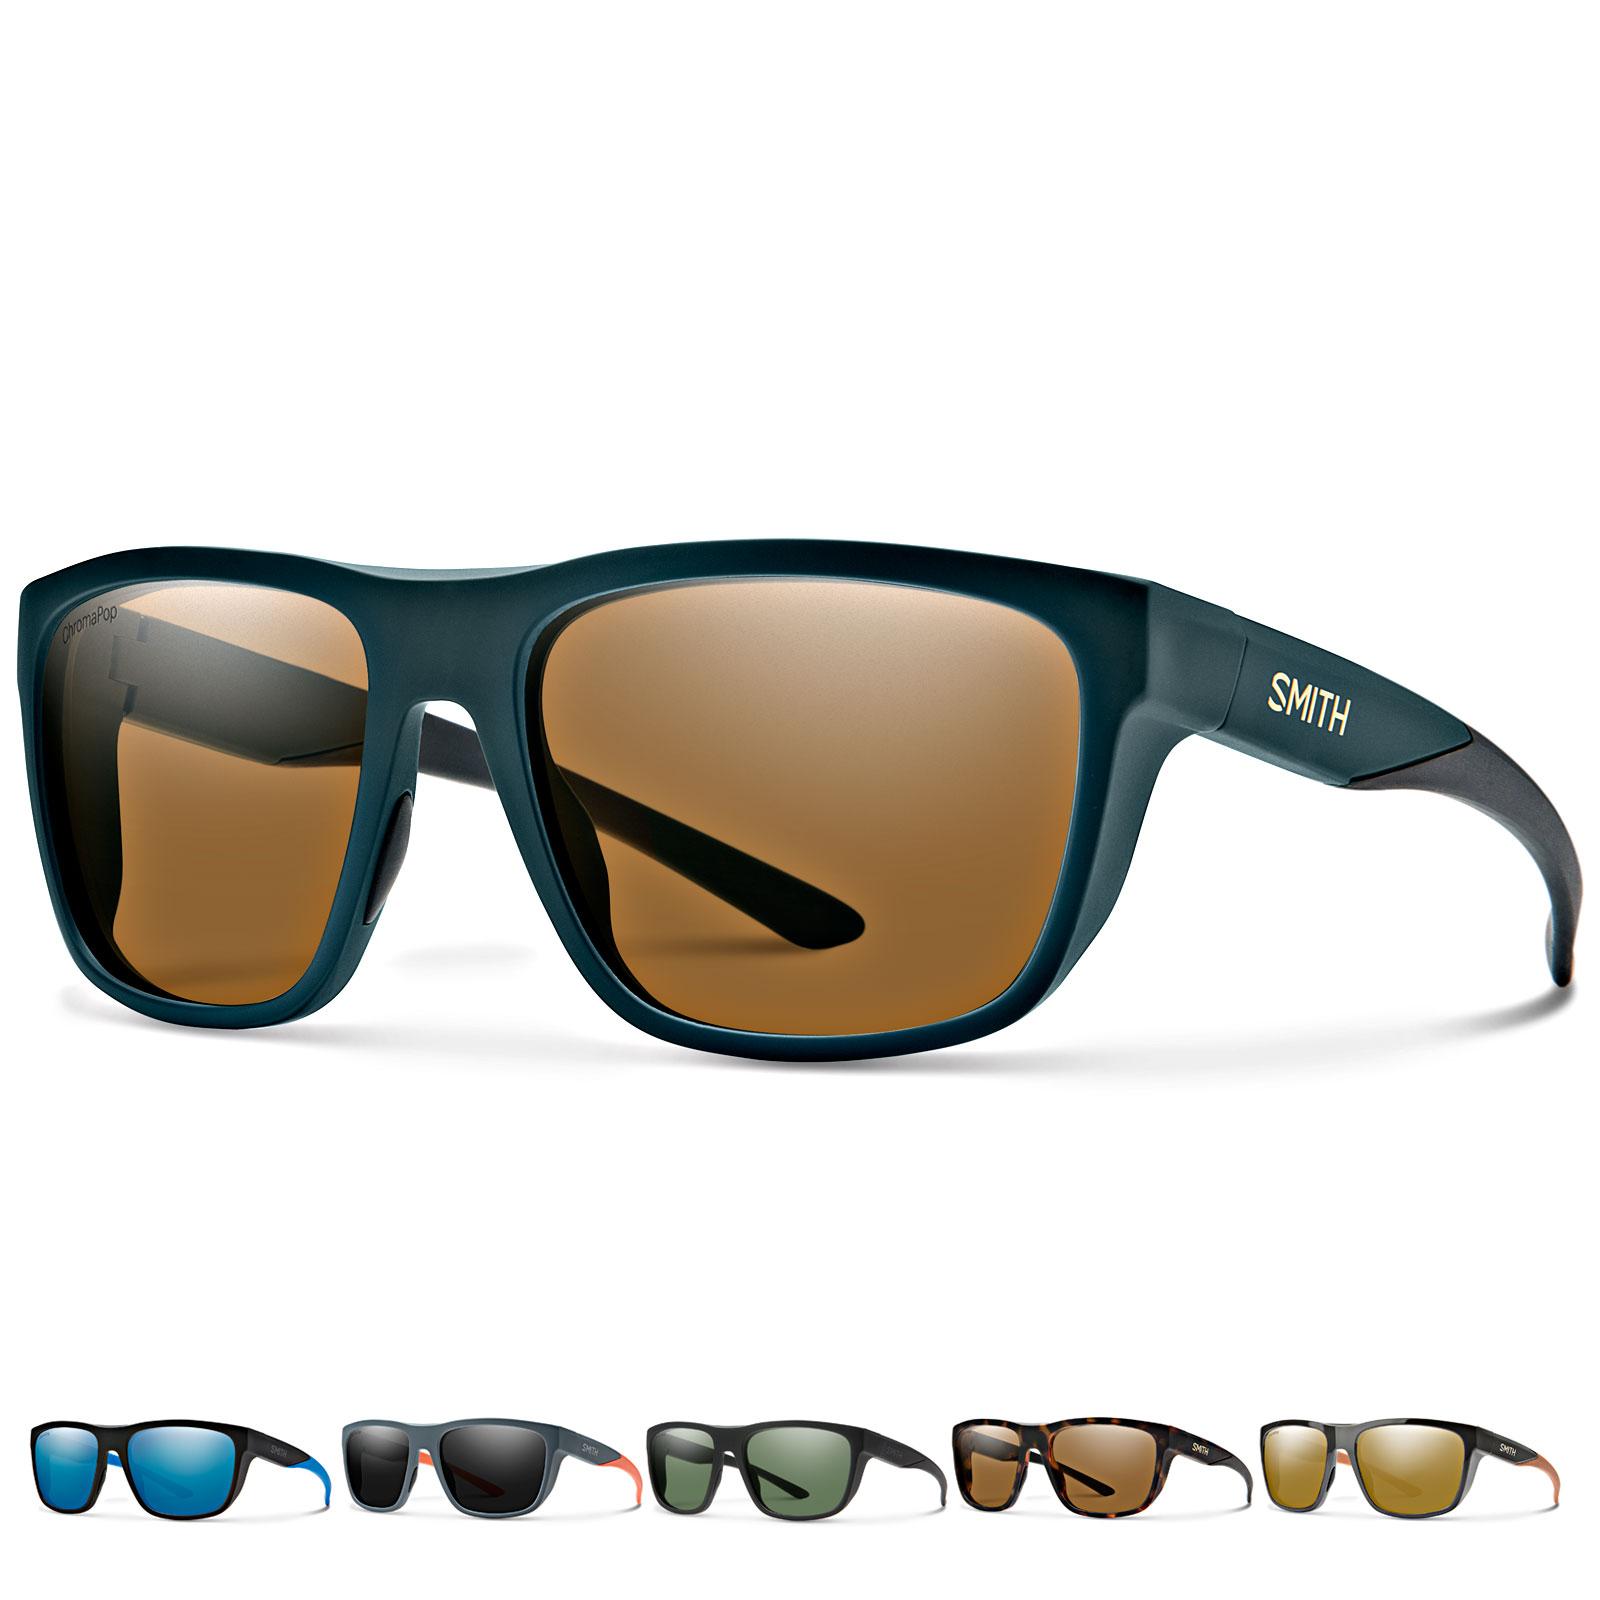 0dbea3f5cc Smith Optics Barra Sunglasses - AvidMax